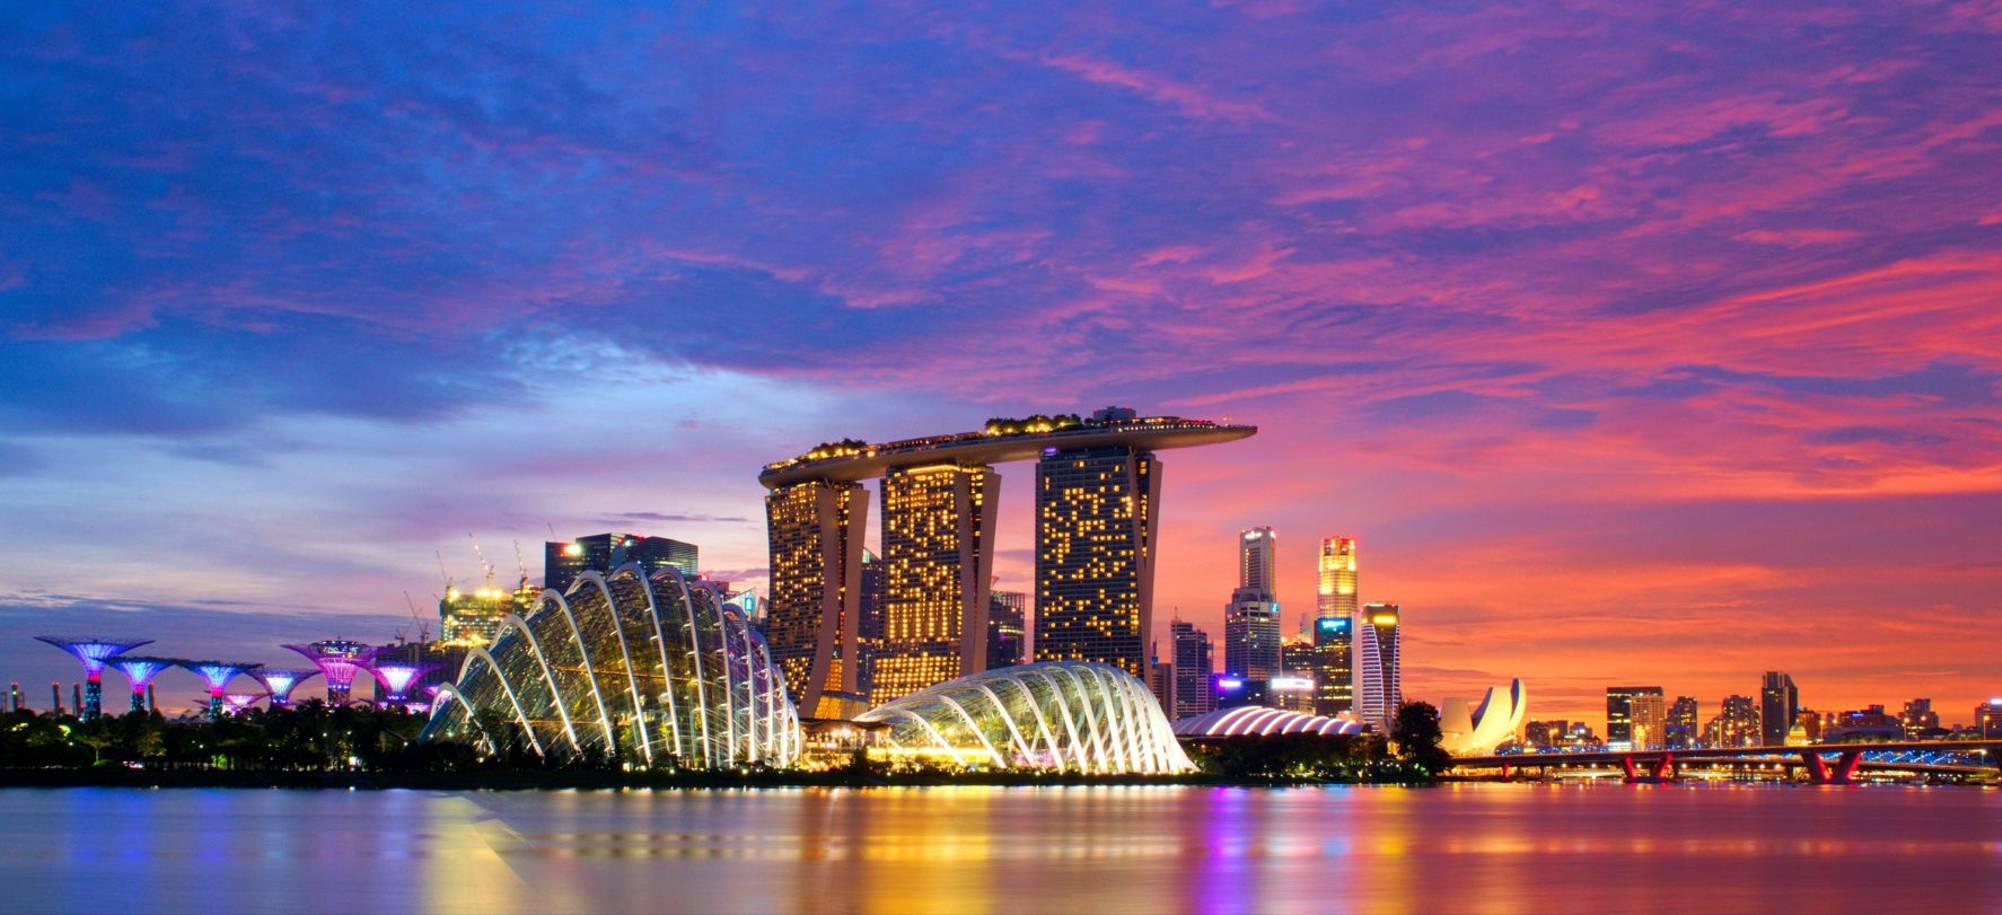 24 Day - Singapore - Itinerary Desktop.jpg